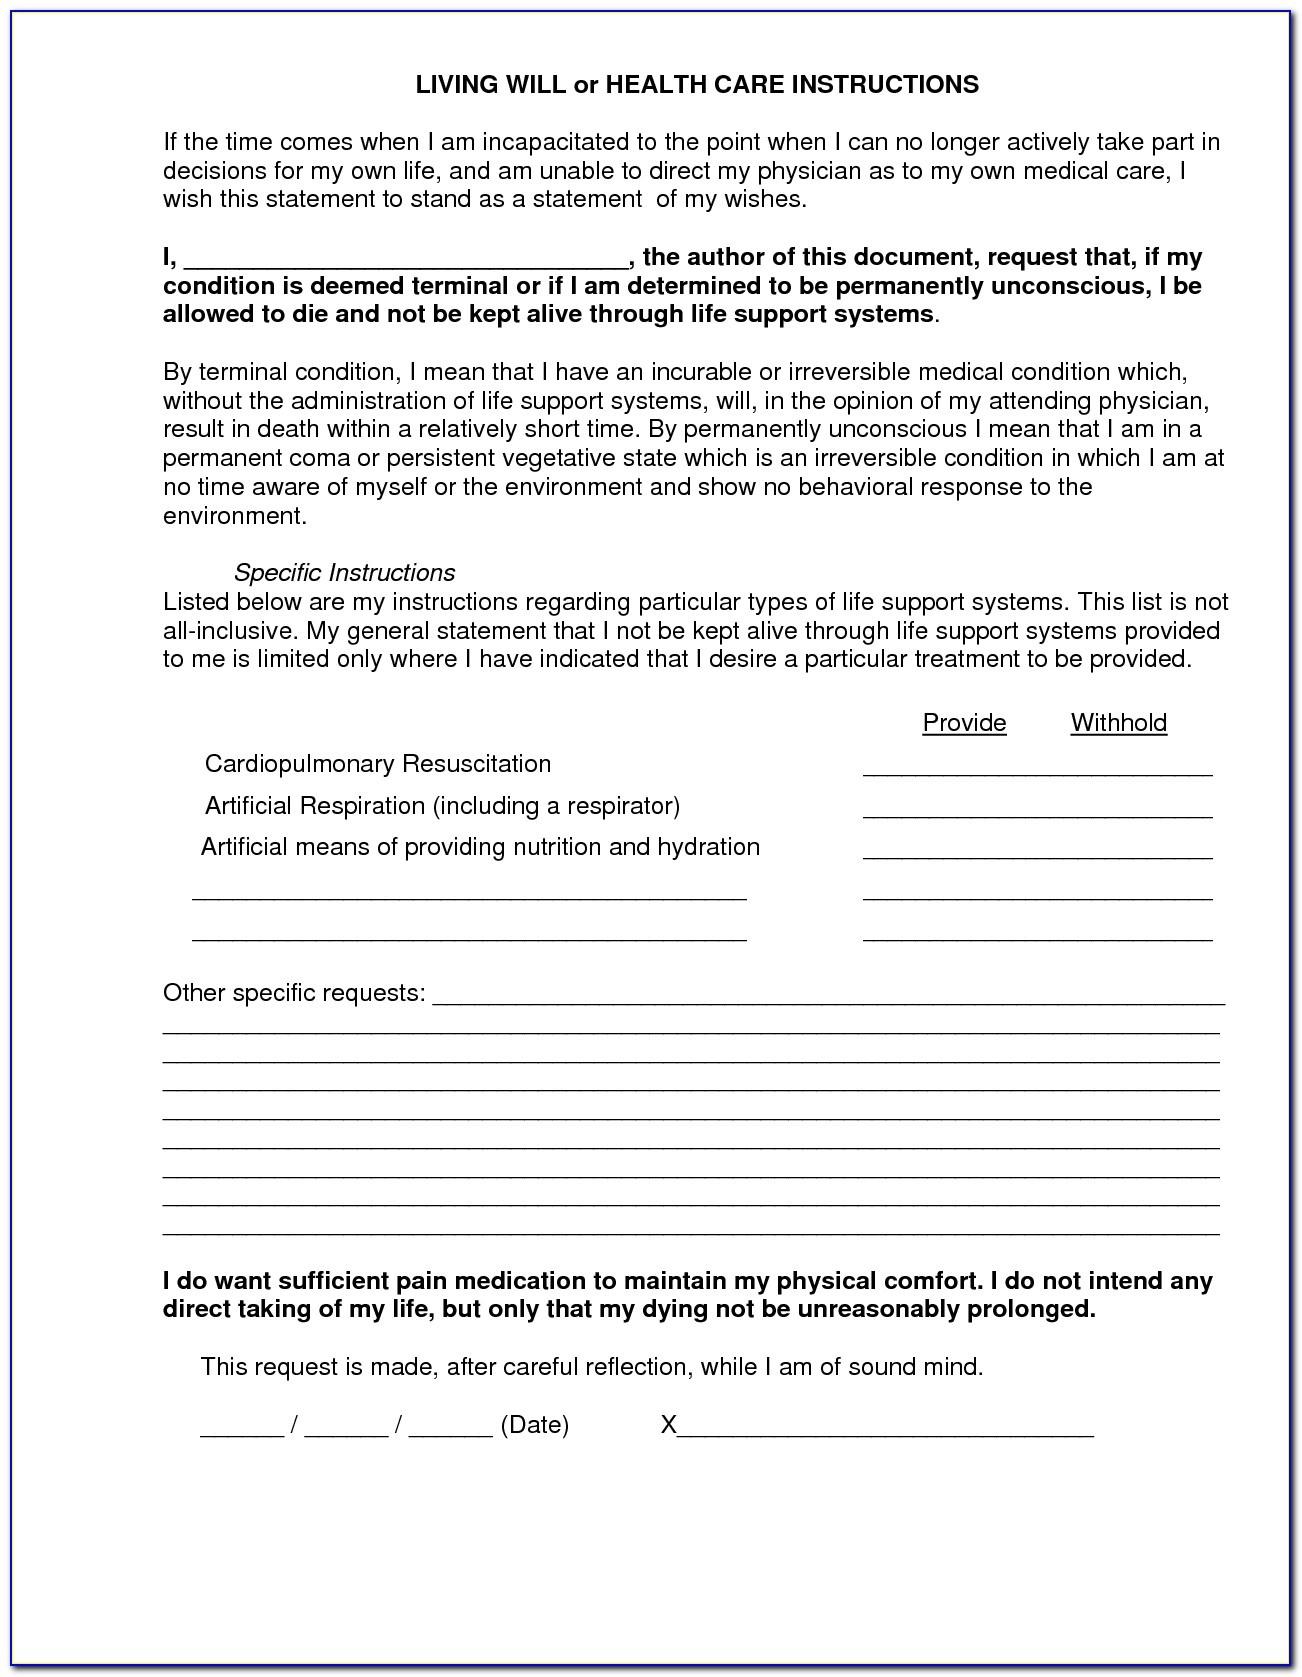 Free Printable Living Will Forms Oklahoma - Form : Resume Examples - Living Will Forms Free Printable